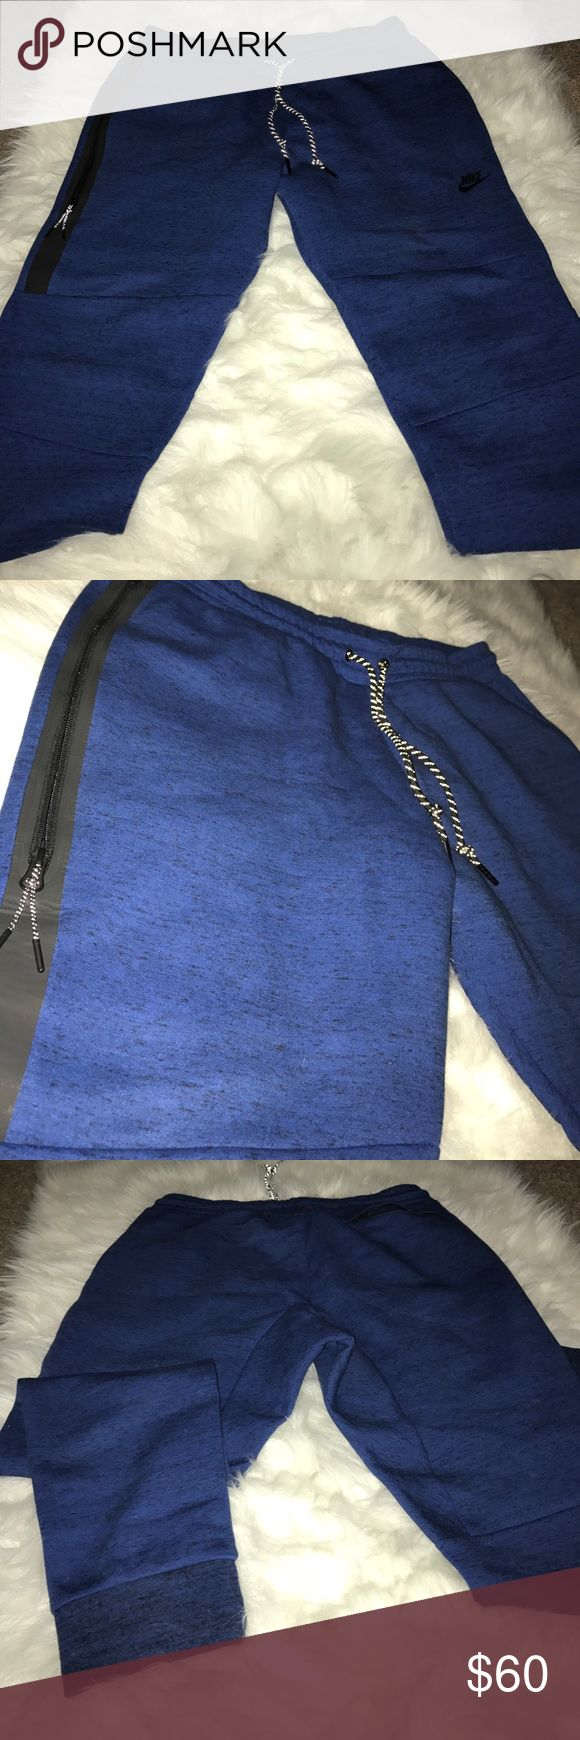 Nike men's fleece tech joggers size xl preowned Nike men's fleece tech joggers size xl preowned Nike Pants Sweatpants & Joggers